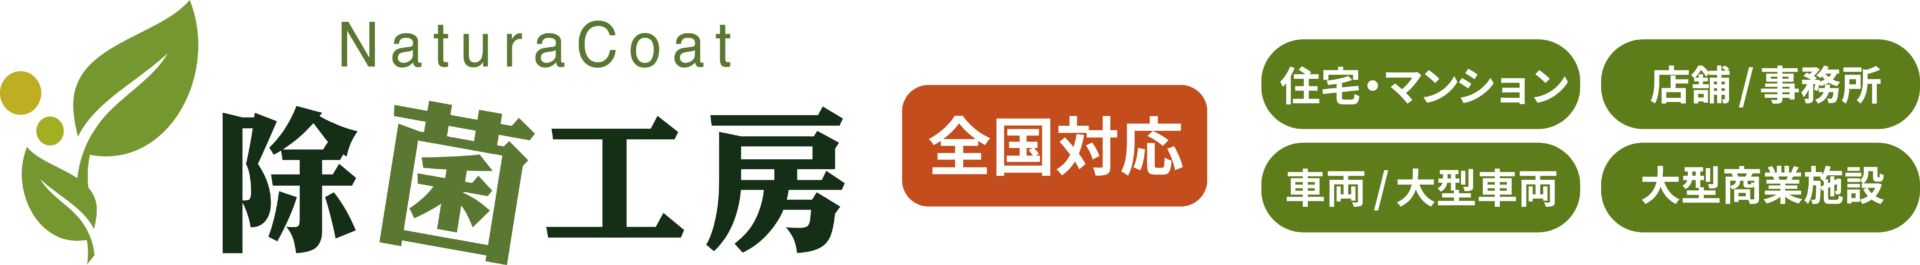 header_vc_logo